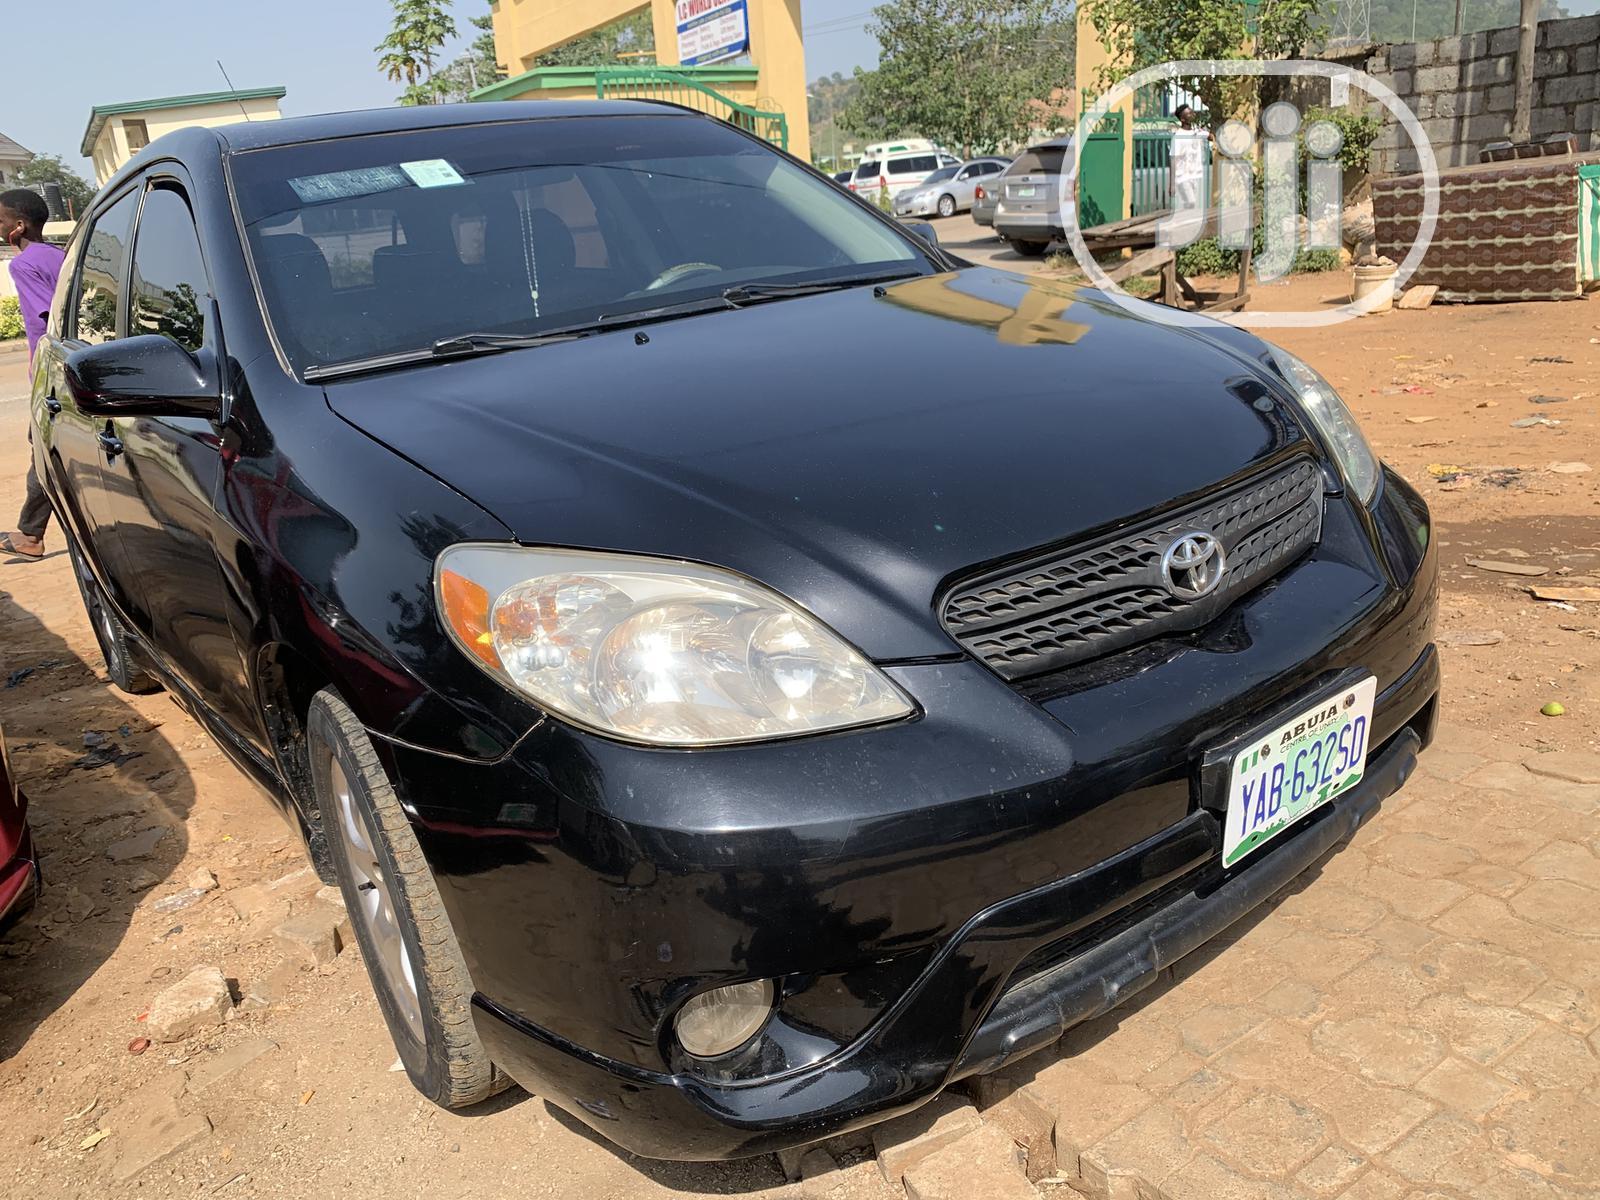 Toyota Matrix 2005 Black In Gwarinpa Cars Mohammed Yemi Jiji Ng For Sale In Gwarinpa Buy Cars From Mohammed Yemi On Jiji Ng